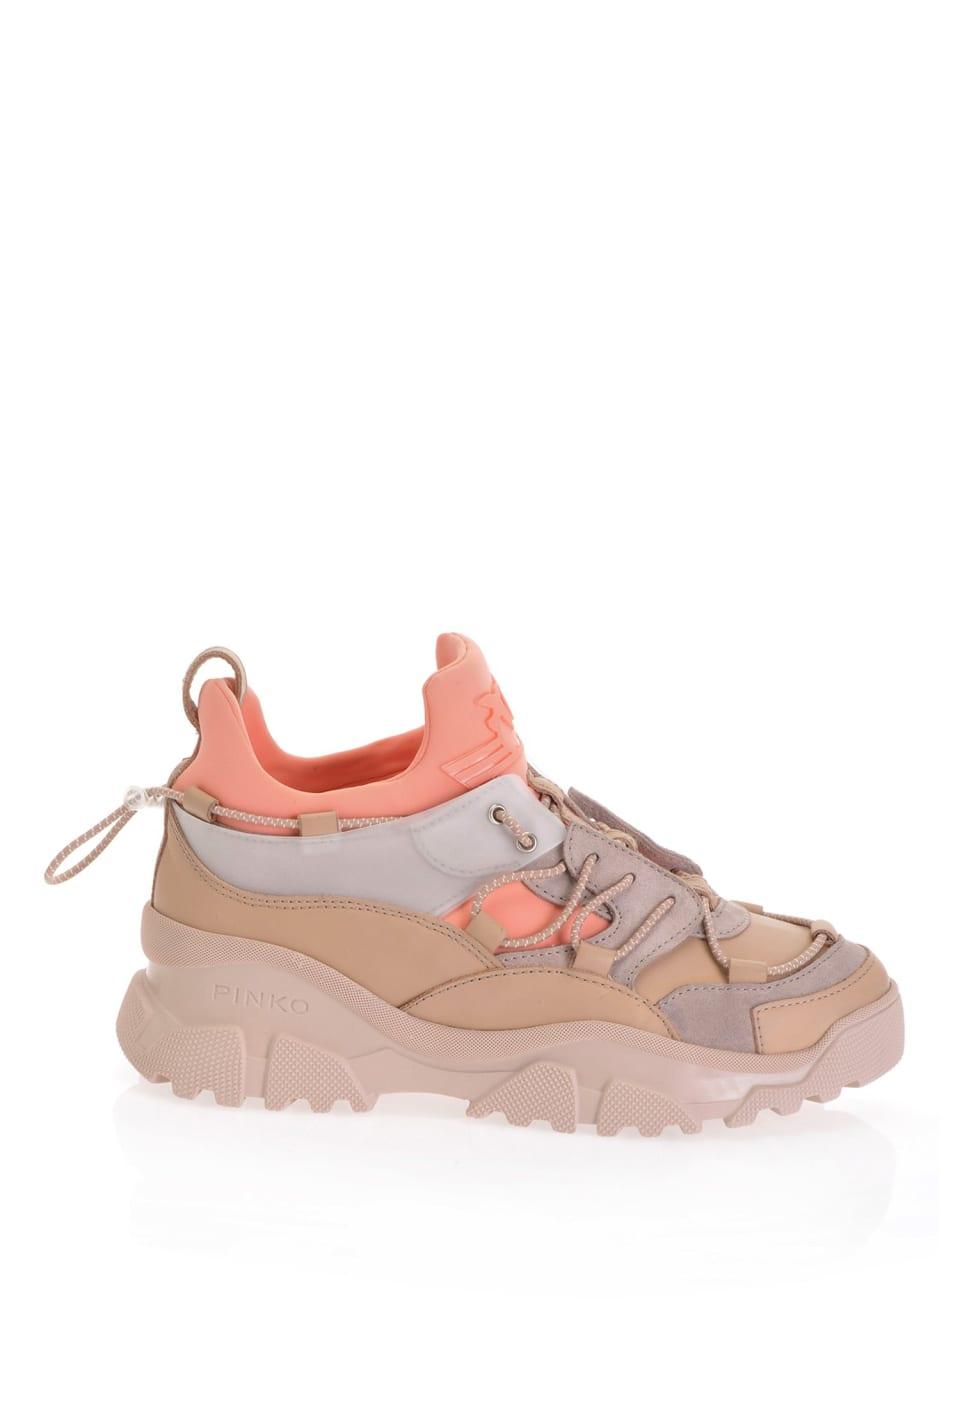 Zapatillas deportivastrekking